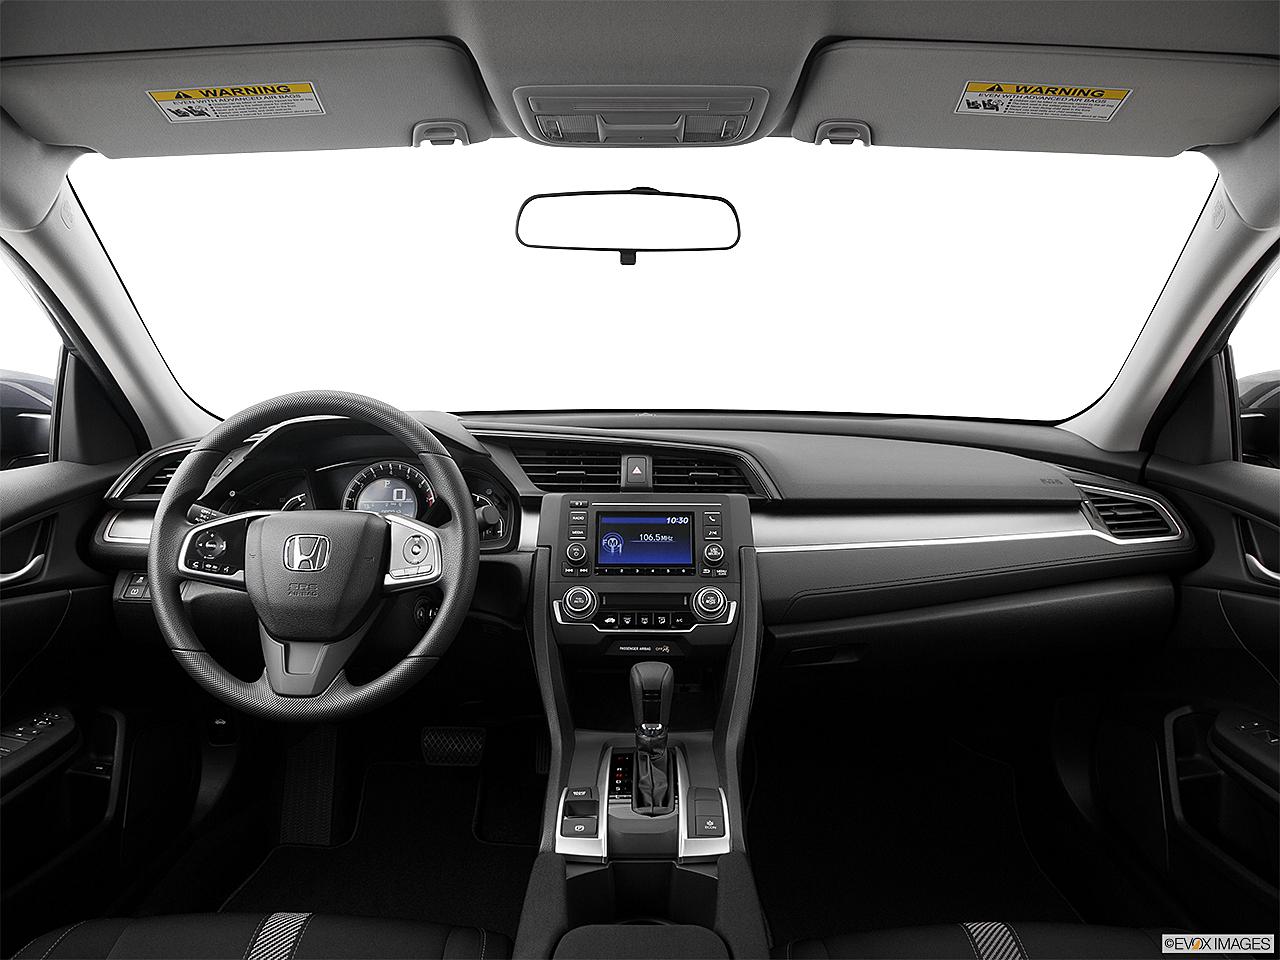 2017 Honda Civic Lx Centered Wide Dash Shot